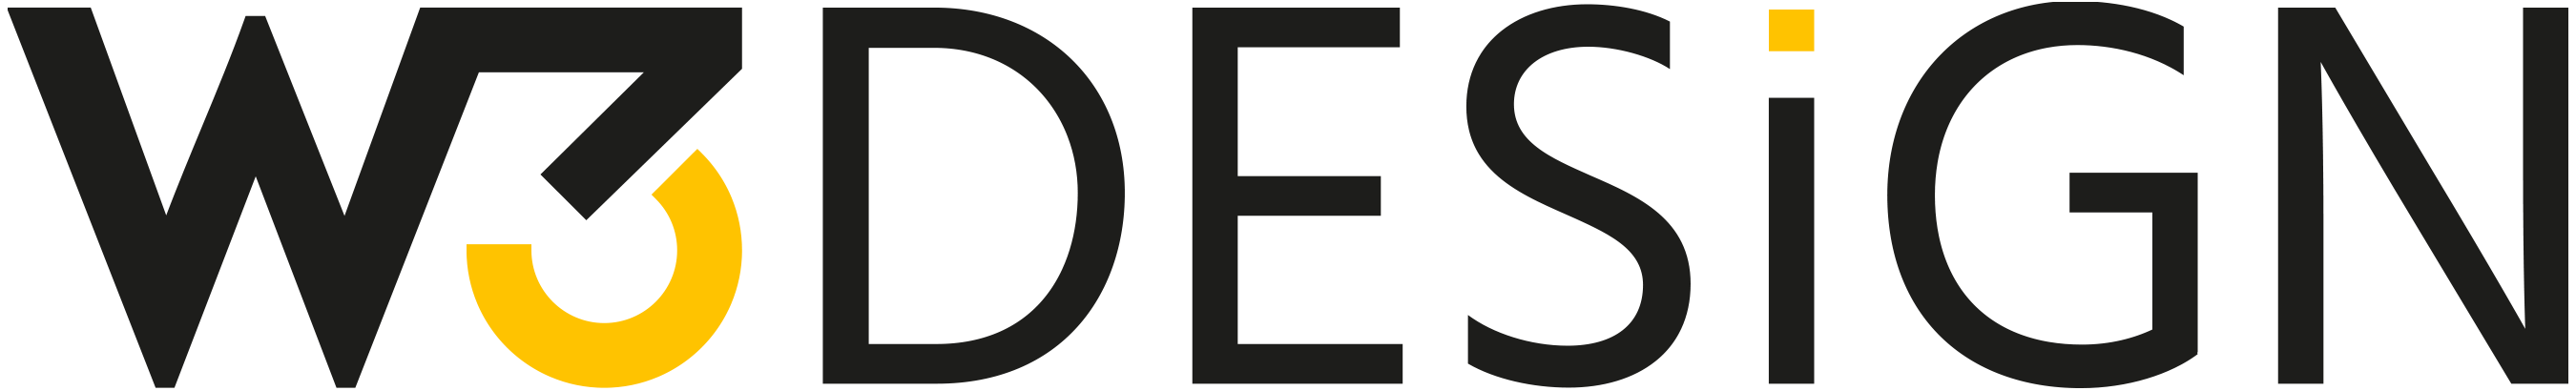 W3design